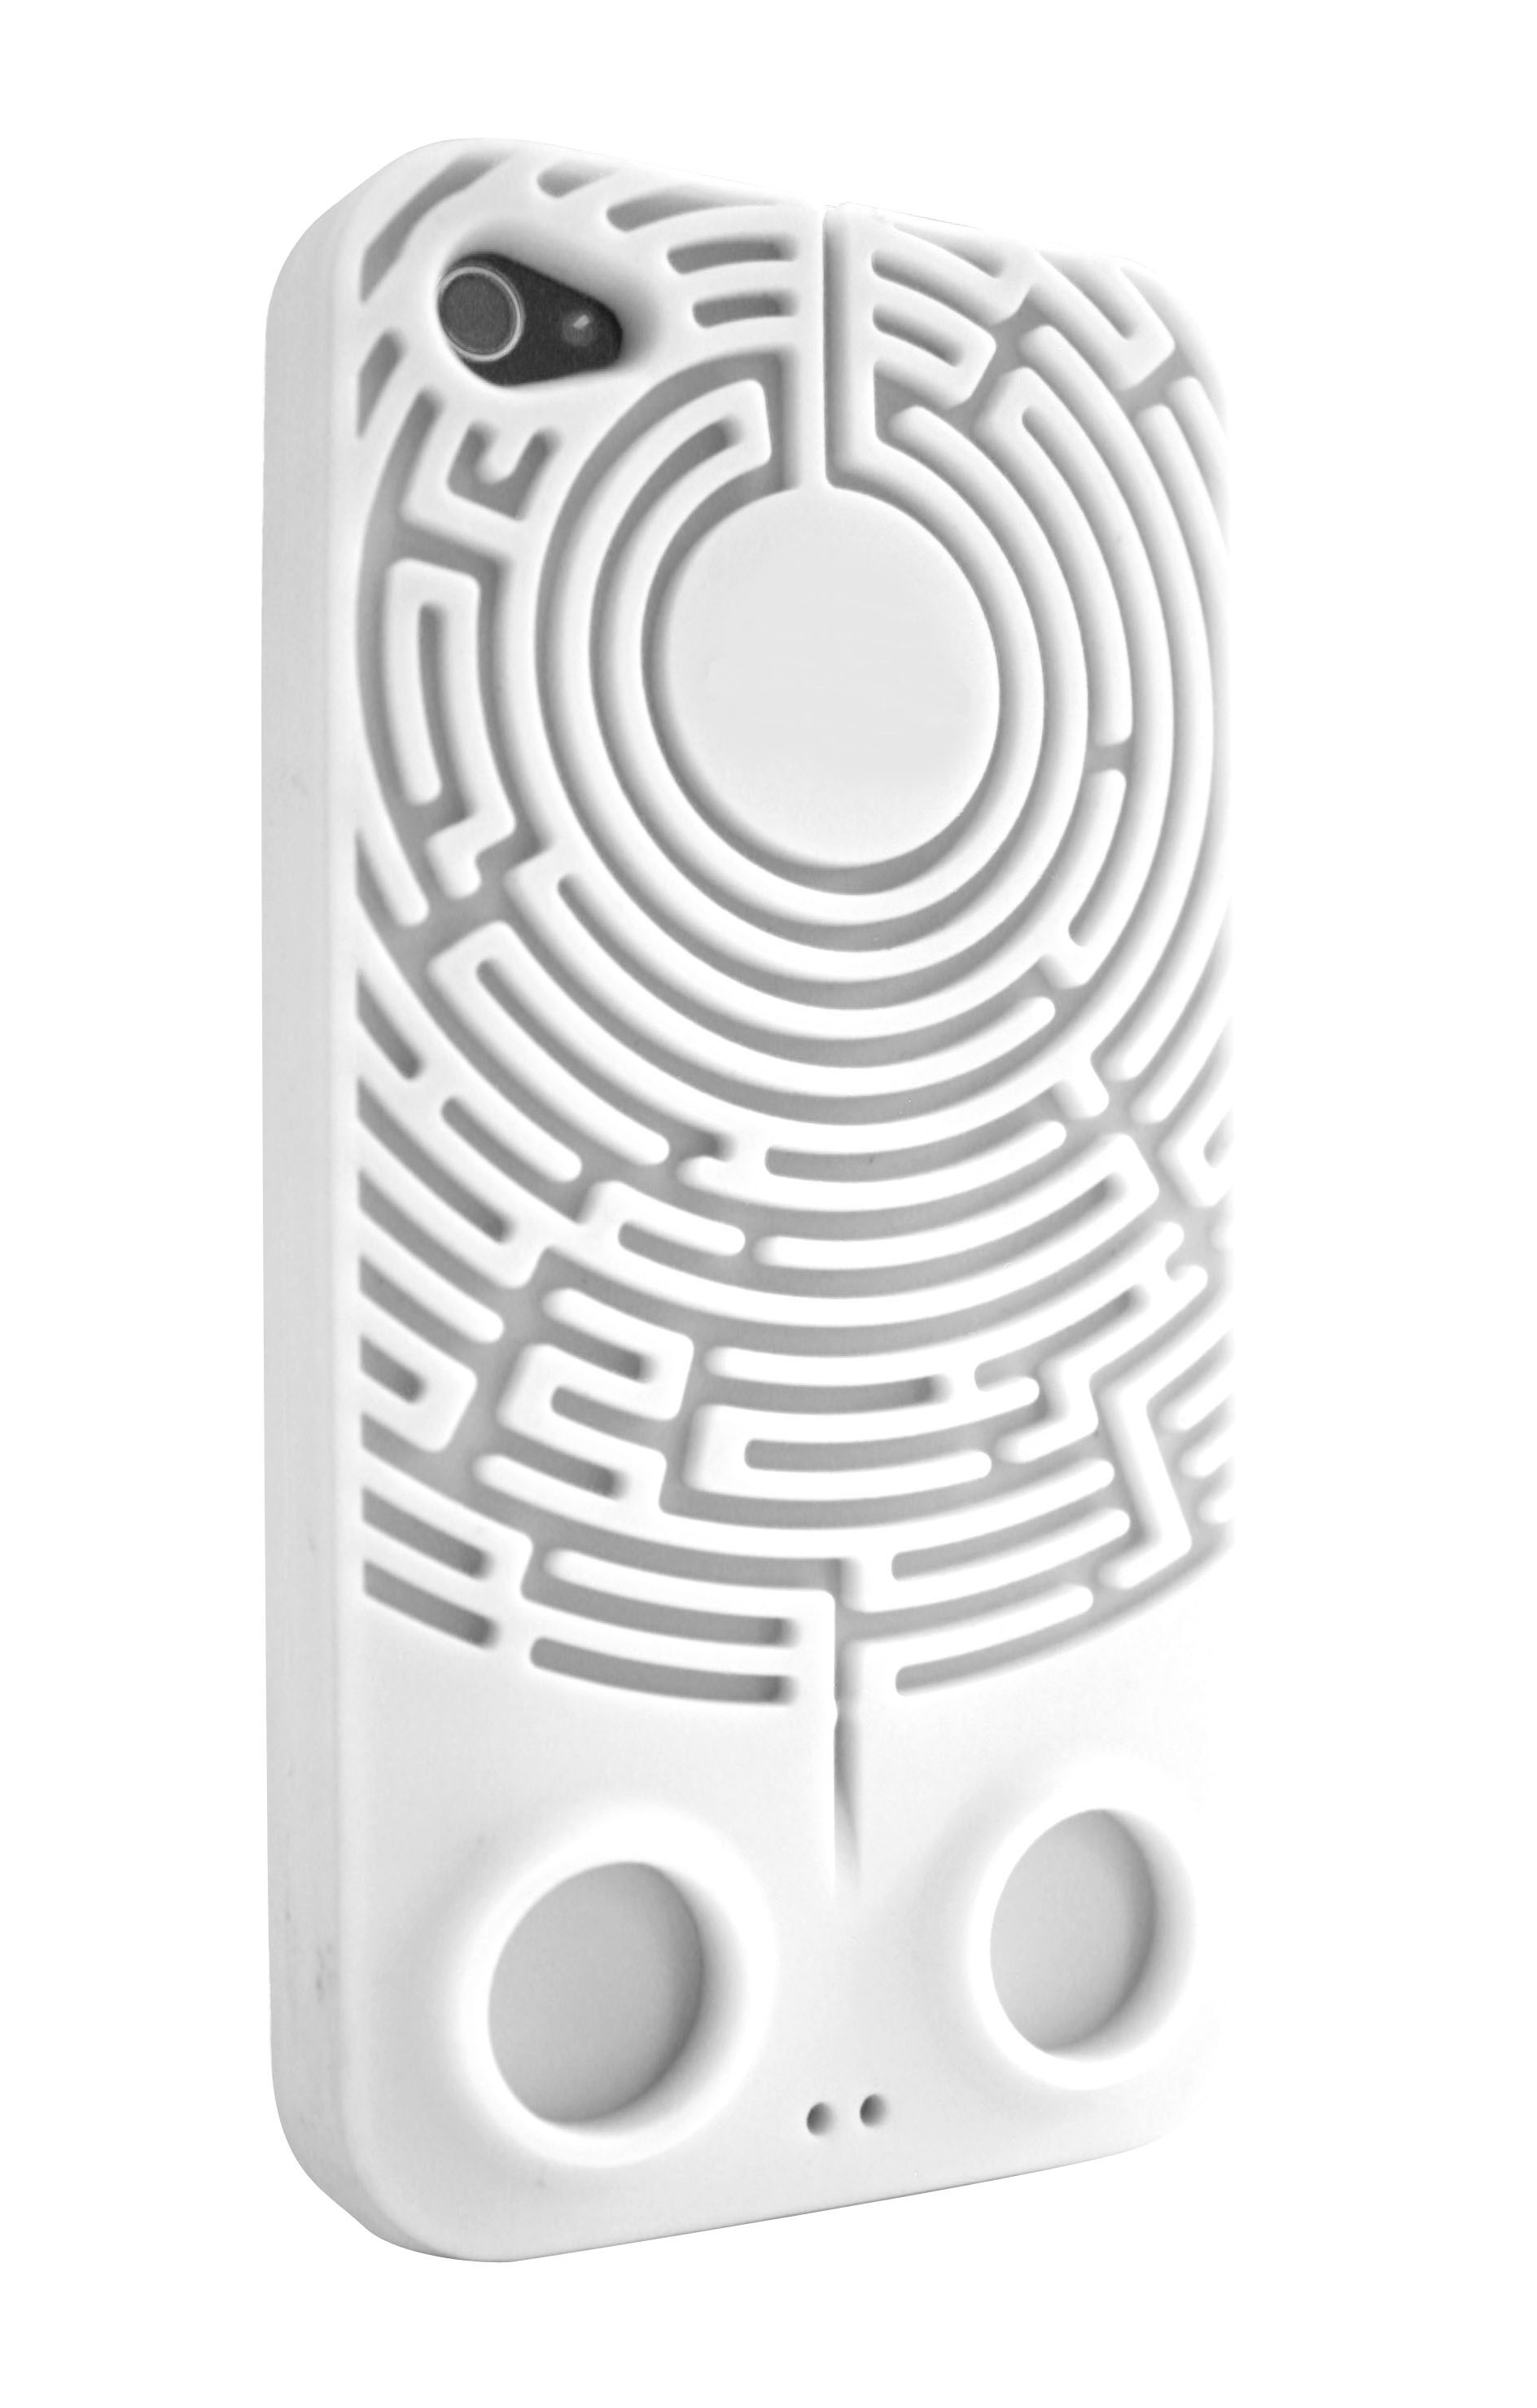 4s / with built in headphone tidy maze / fun gify idea from locomocean ltd